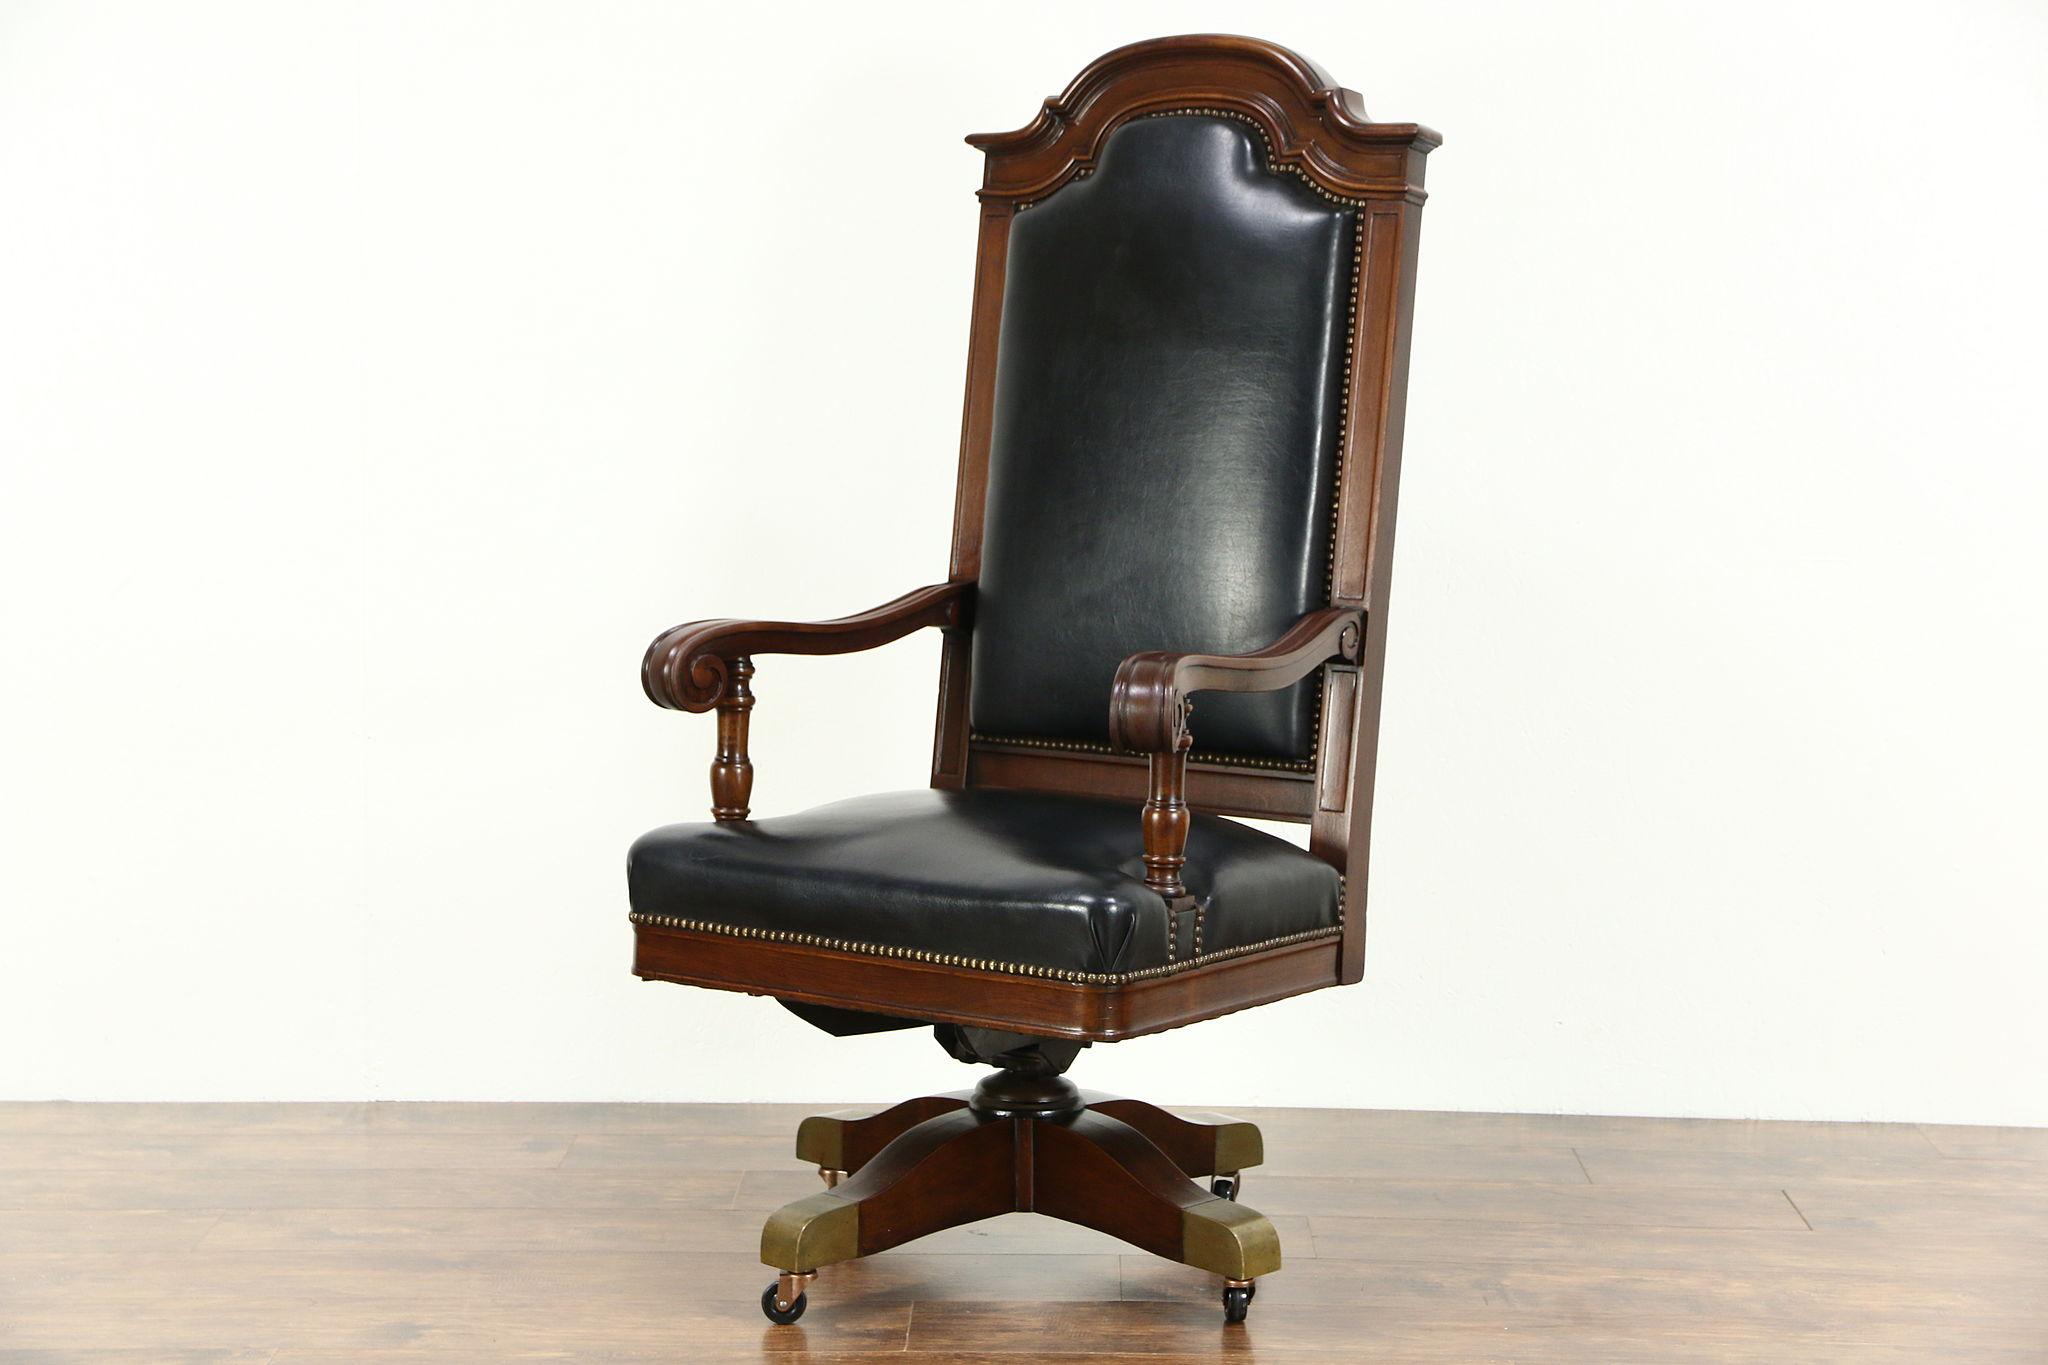 Sold Judge Swivel 1915 Antique Walnut Amp Leather Desk